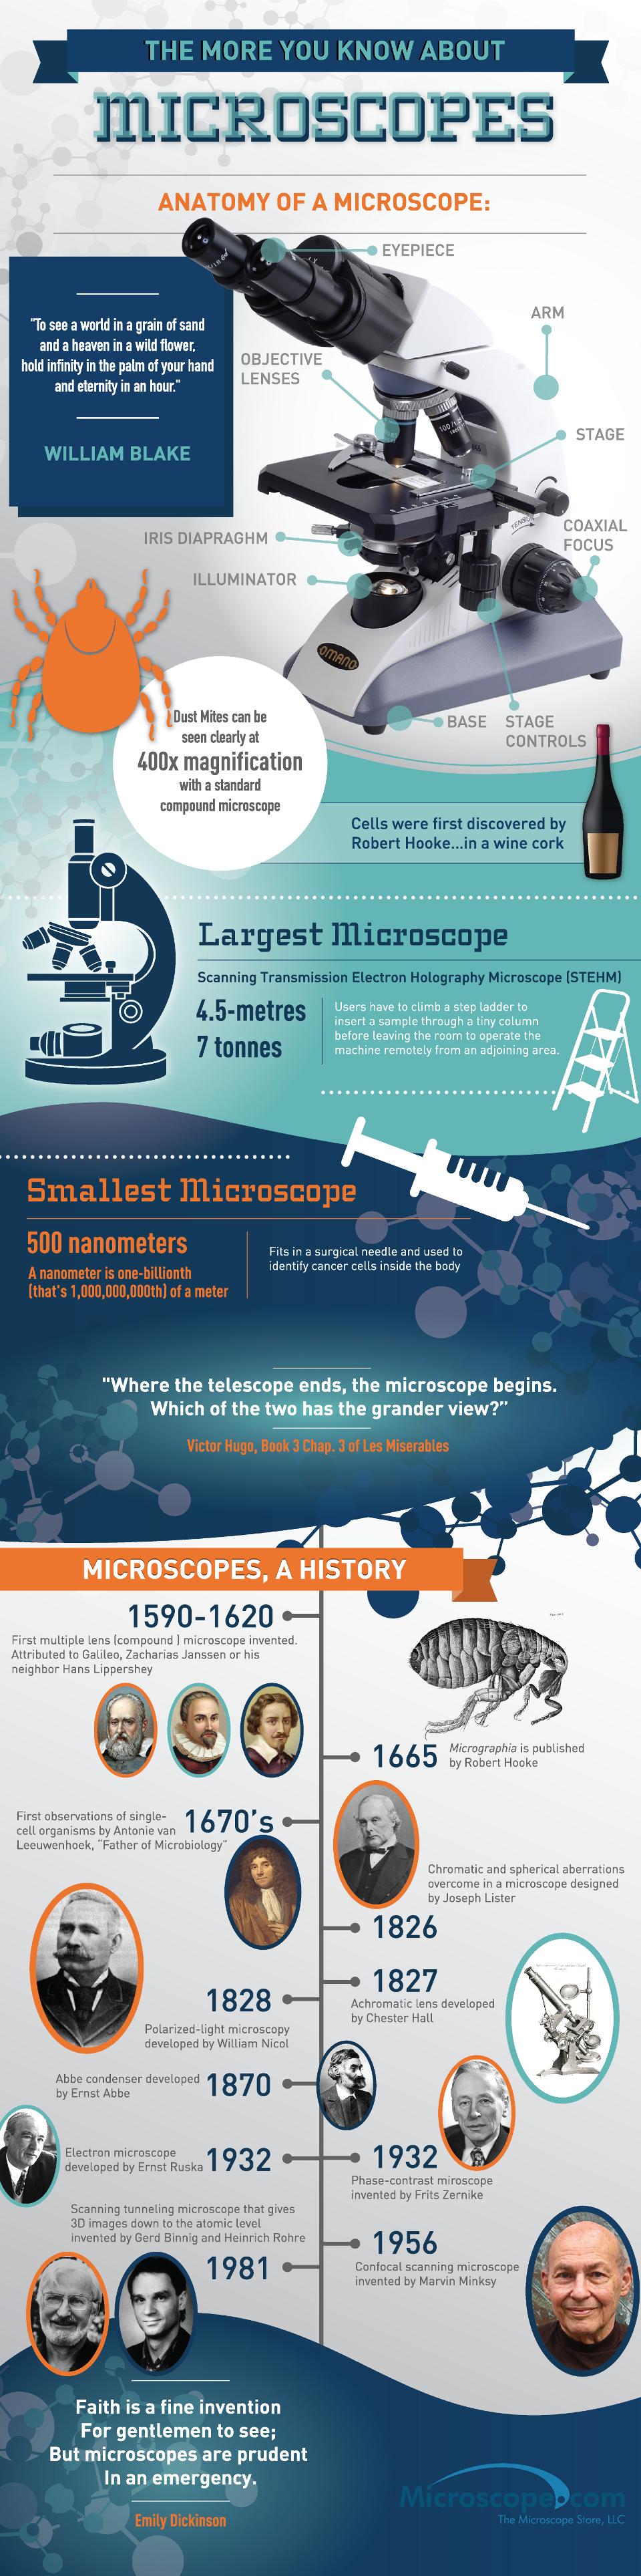 Anatomy Of The Microscope